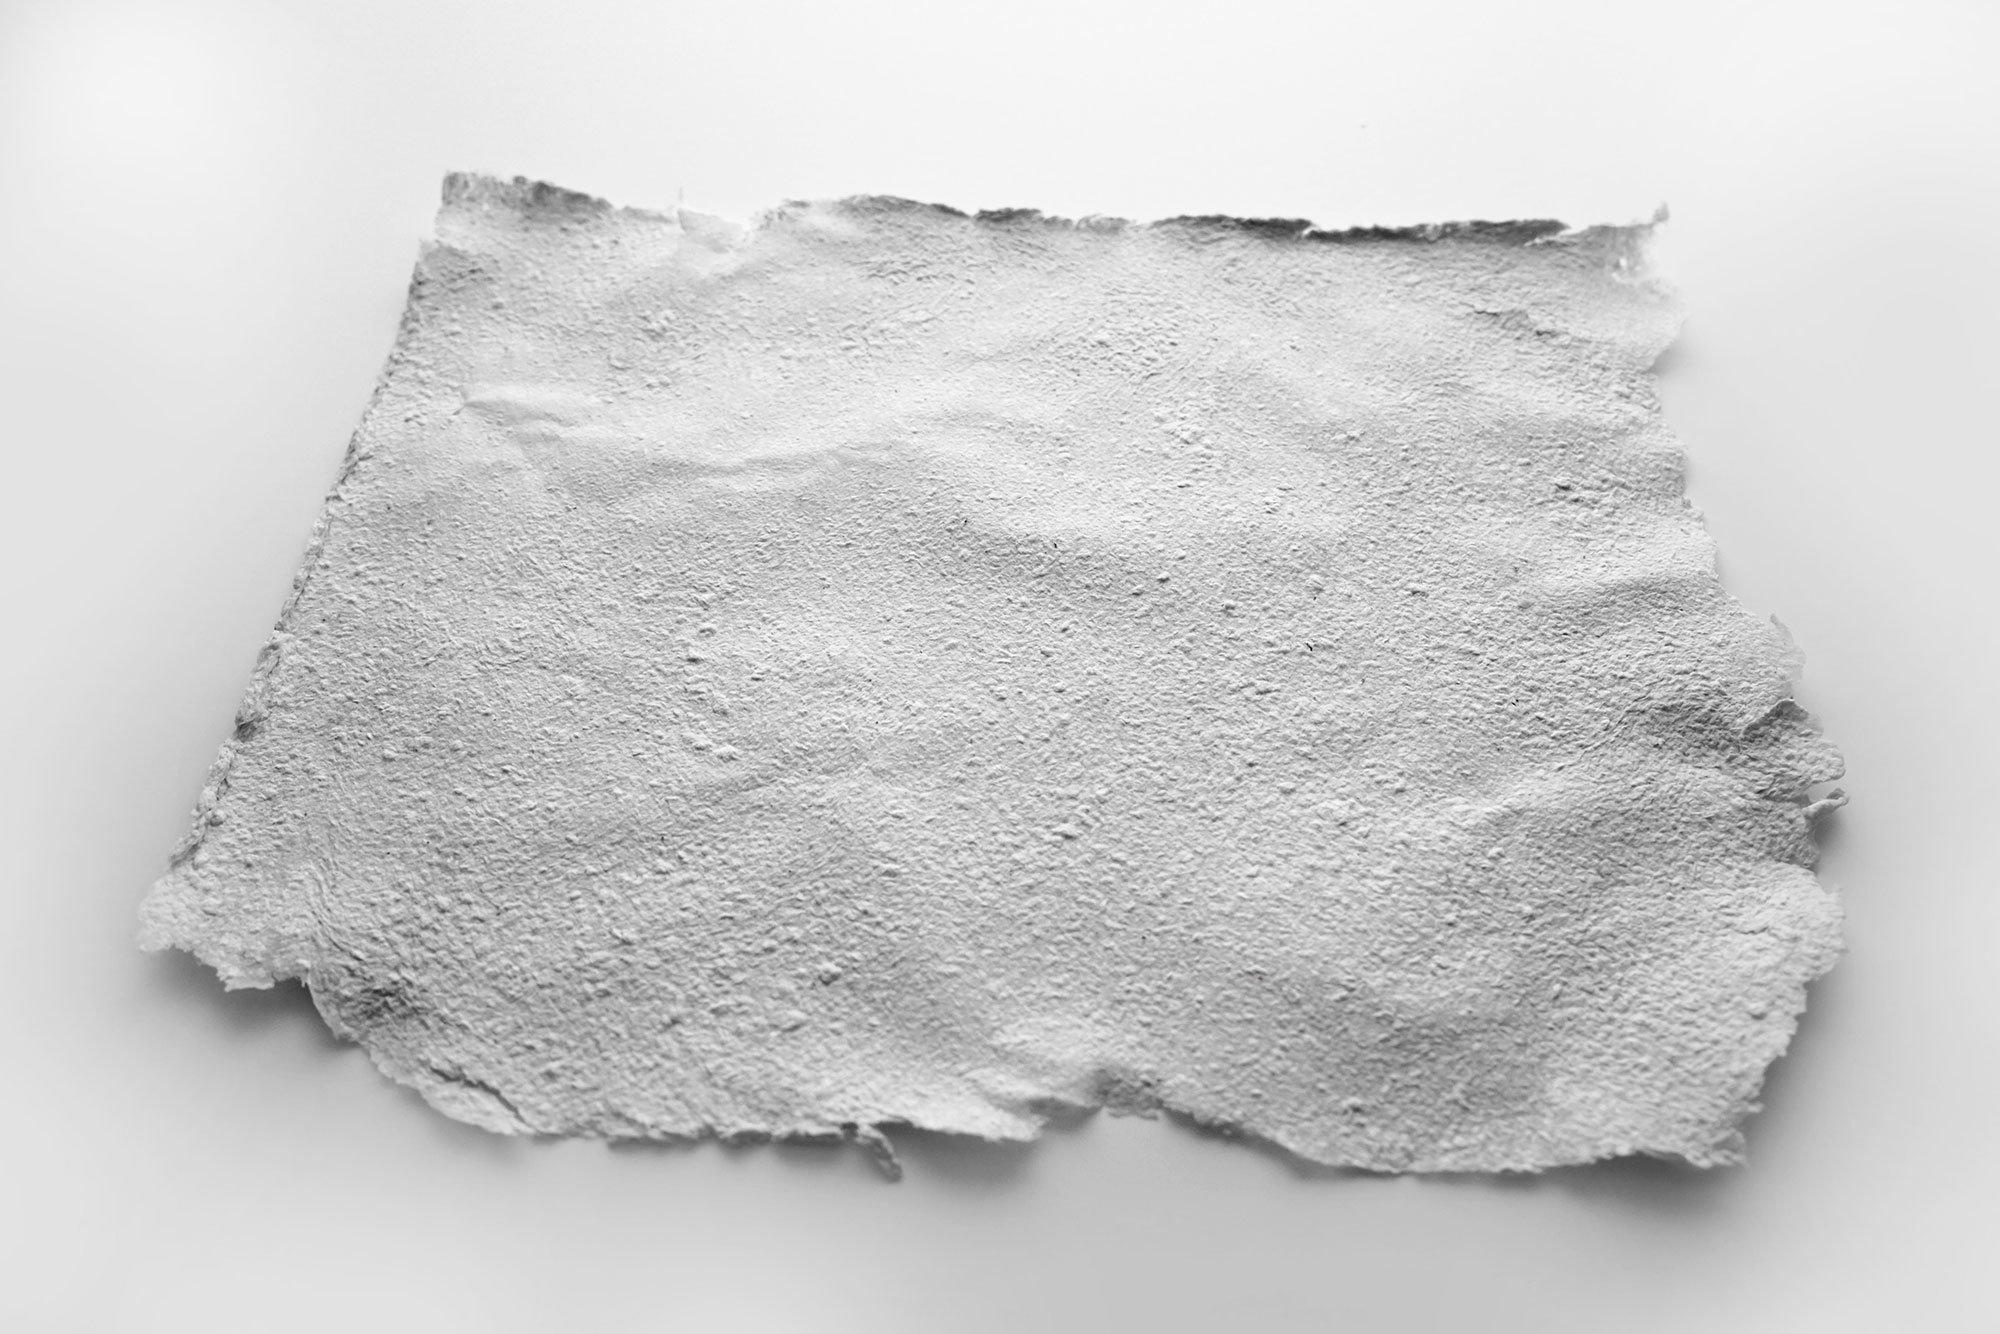 Paper + Bioplastic, Eva Garibaldi